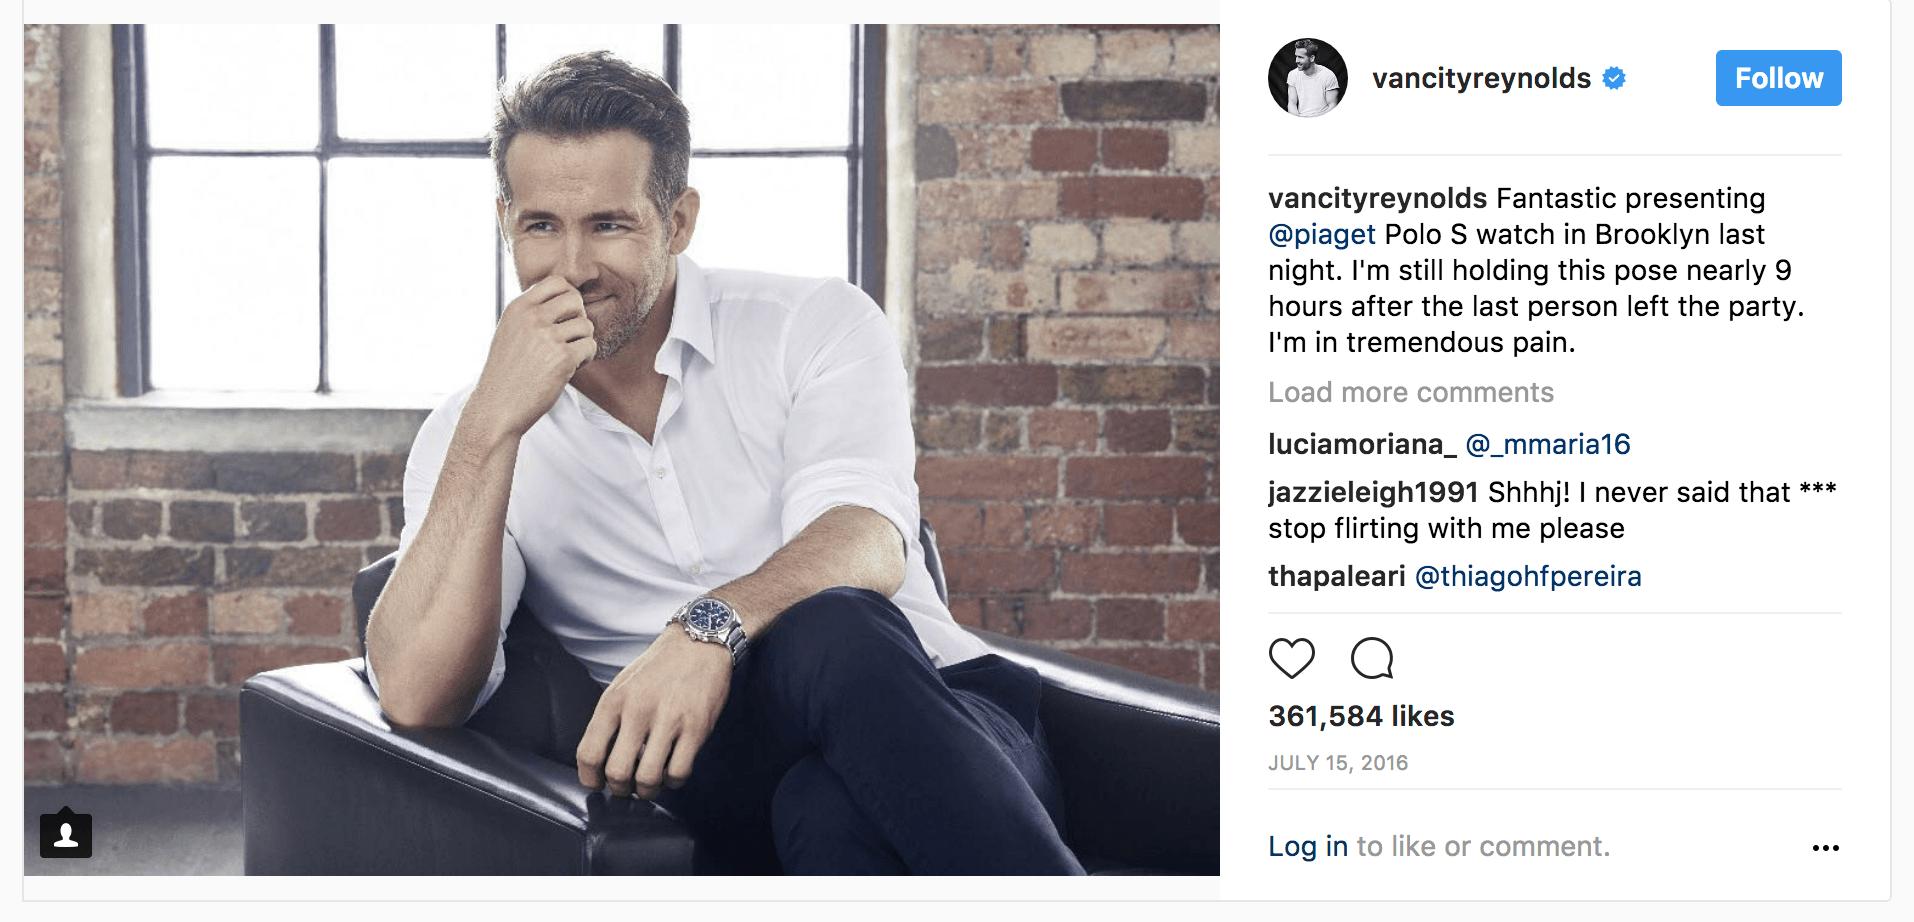 Celebrity endorsement as social proof - Ryan Reynolds on Instagram